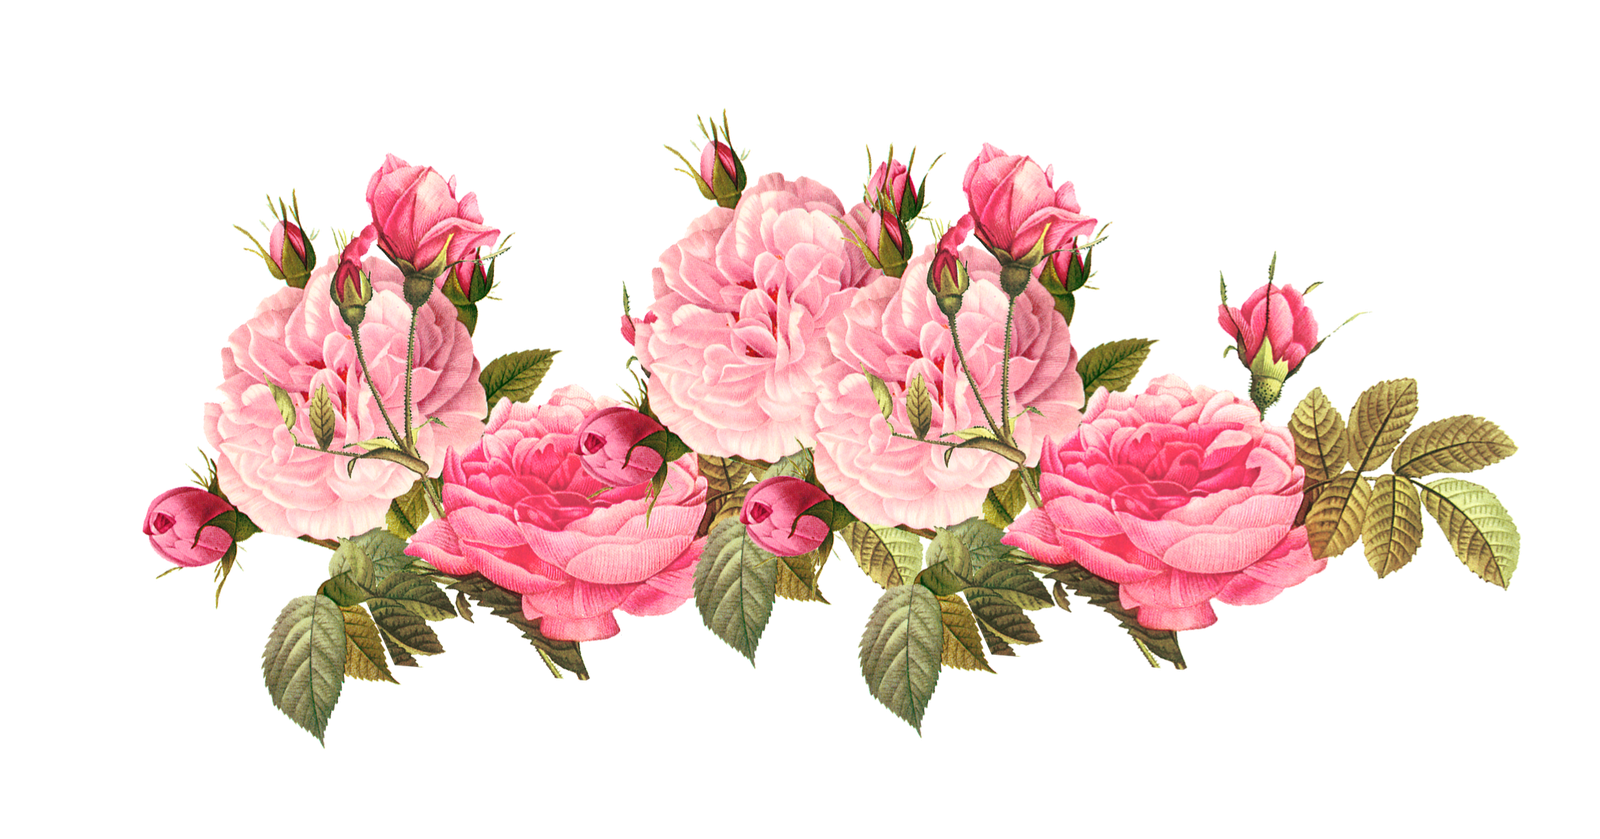 Image 4851255e0188e91462a811d5bdbfaeb1 vintage pink roses pink 4851255e0188e91462a811d5bdbfaeb1 vintage pink roses pink roses clipart tumblr 1600 839g mightylinksfo